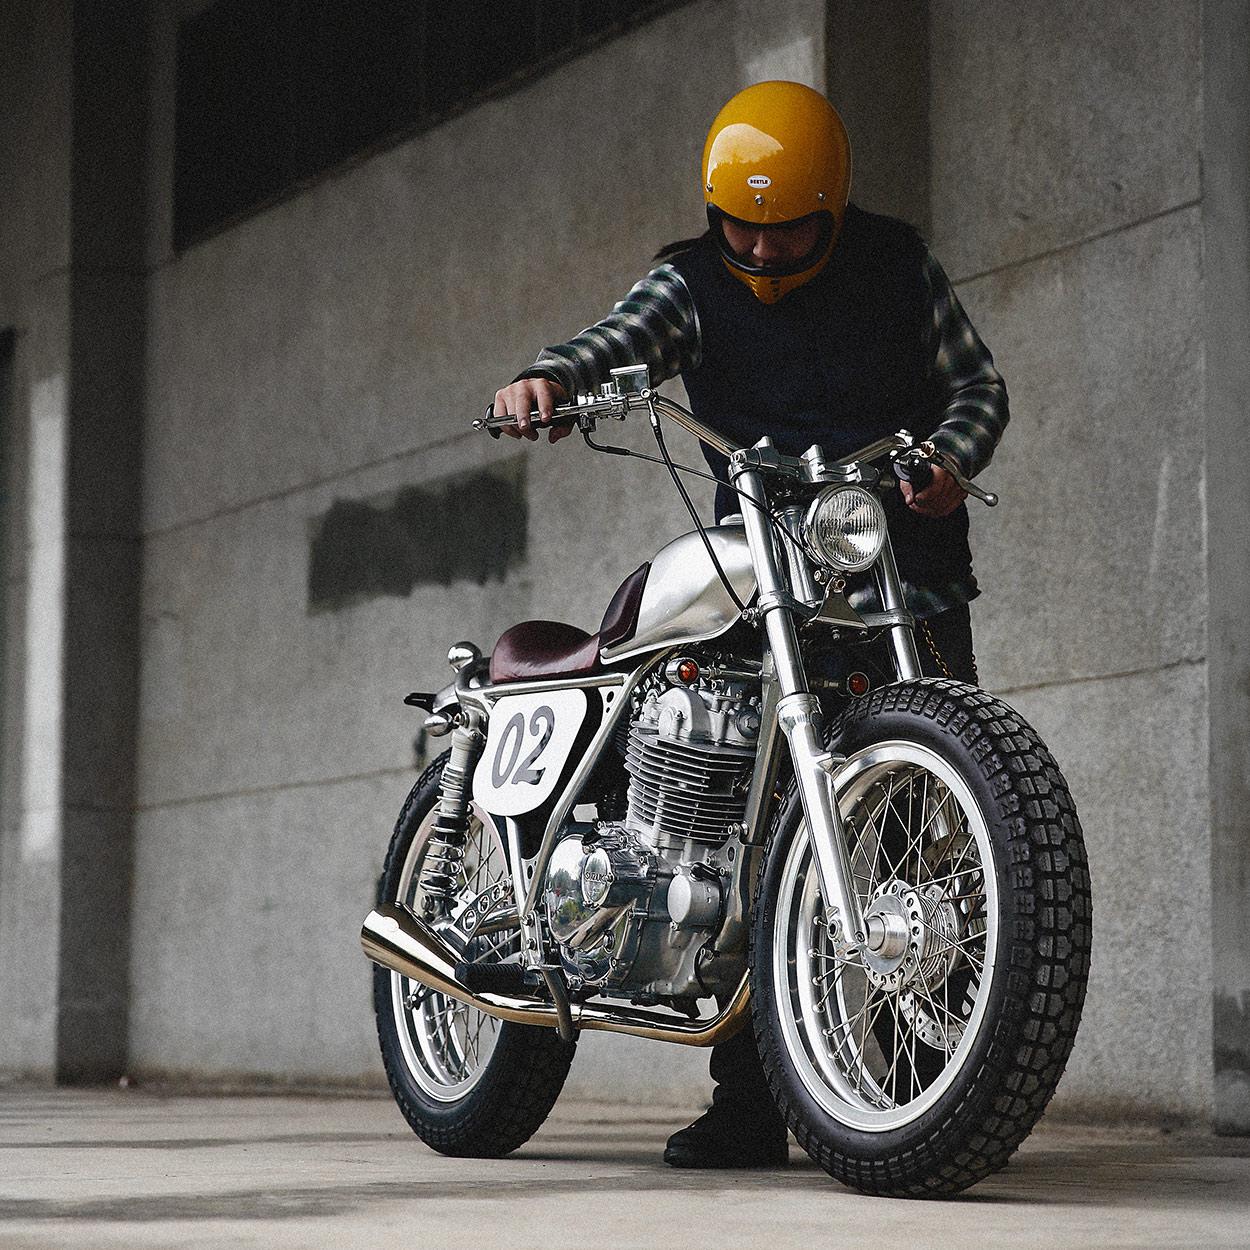 Small but perfectly formed: 2LOUD's Suzuki TU250 | Bike EXIF